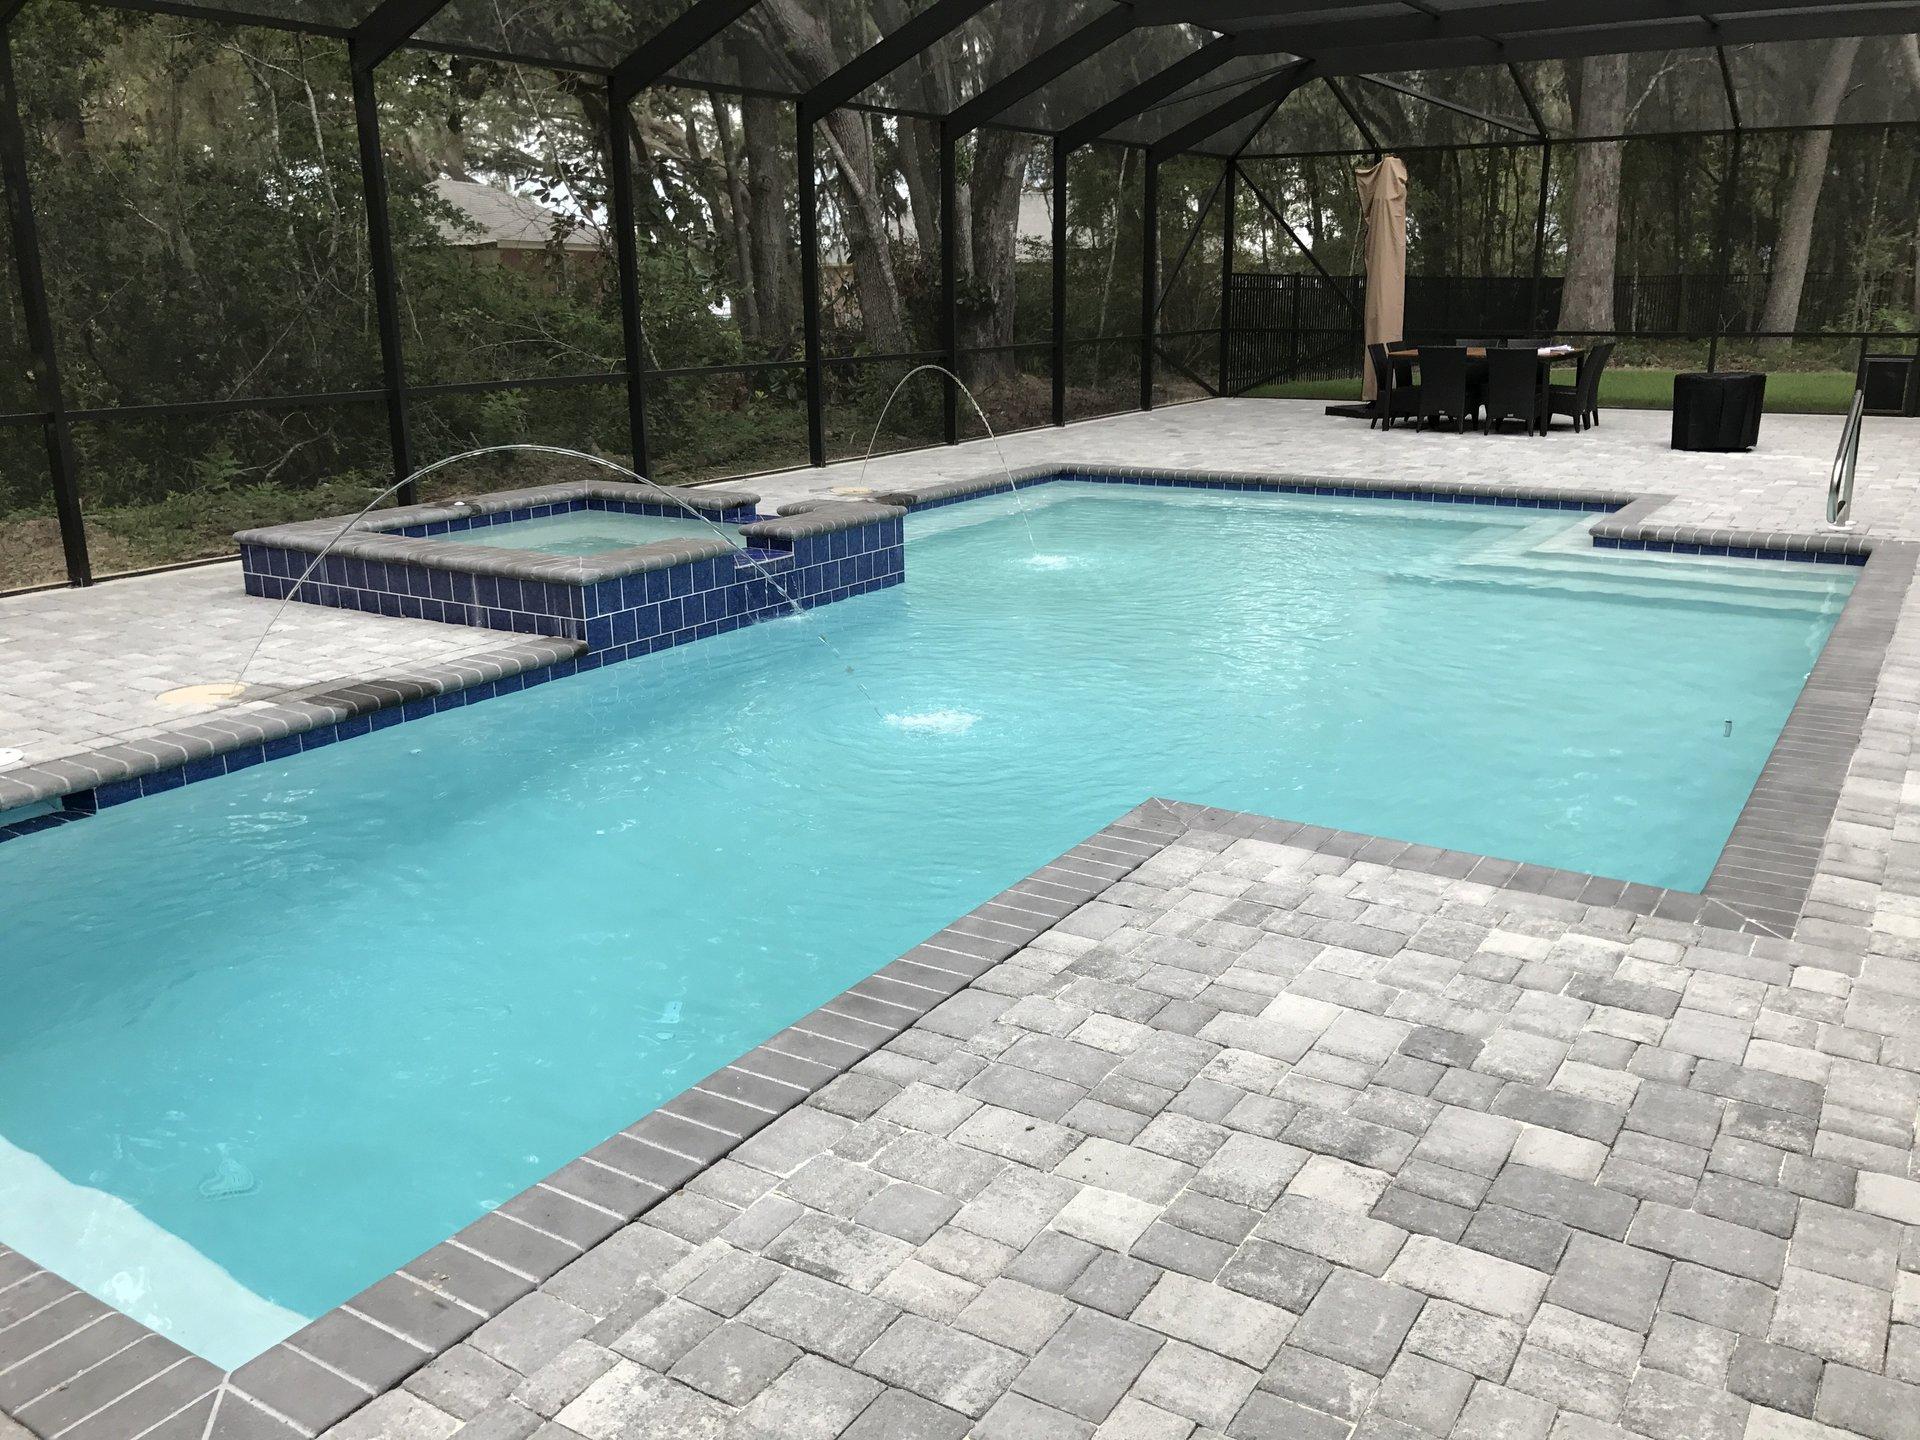 Home Paradise Pools, LLC - Panama City, FL - Gallery